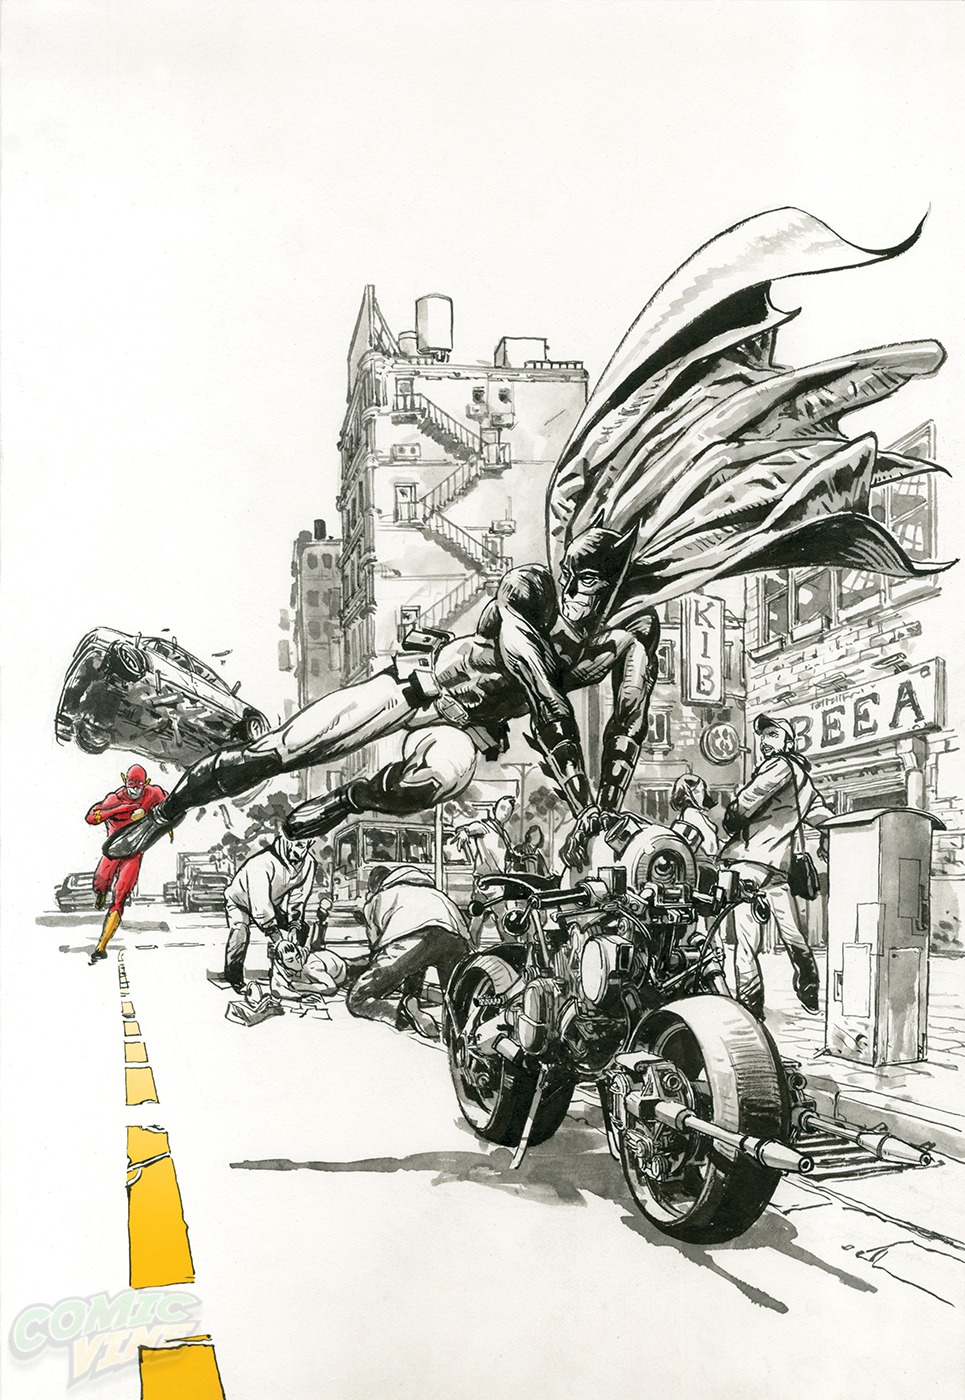 THE FLASH #33 by Kim Jung Gi